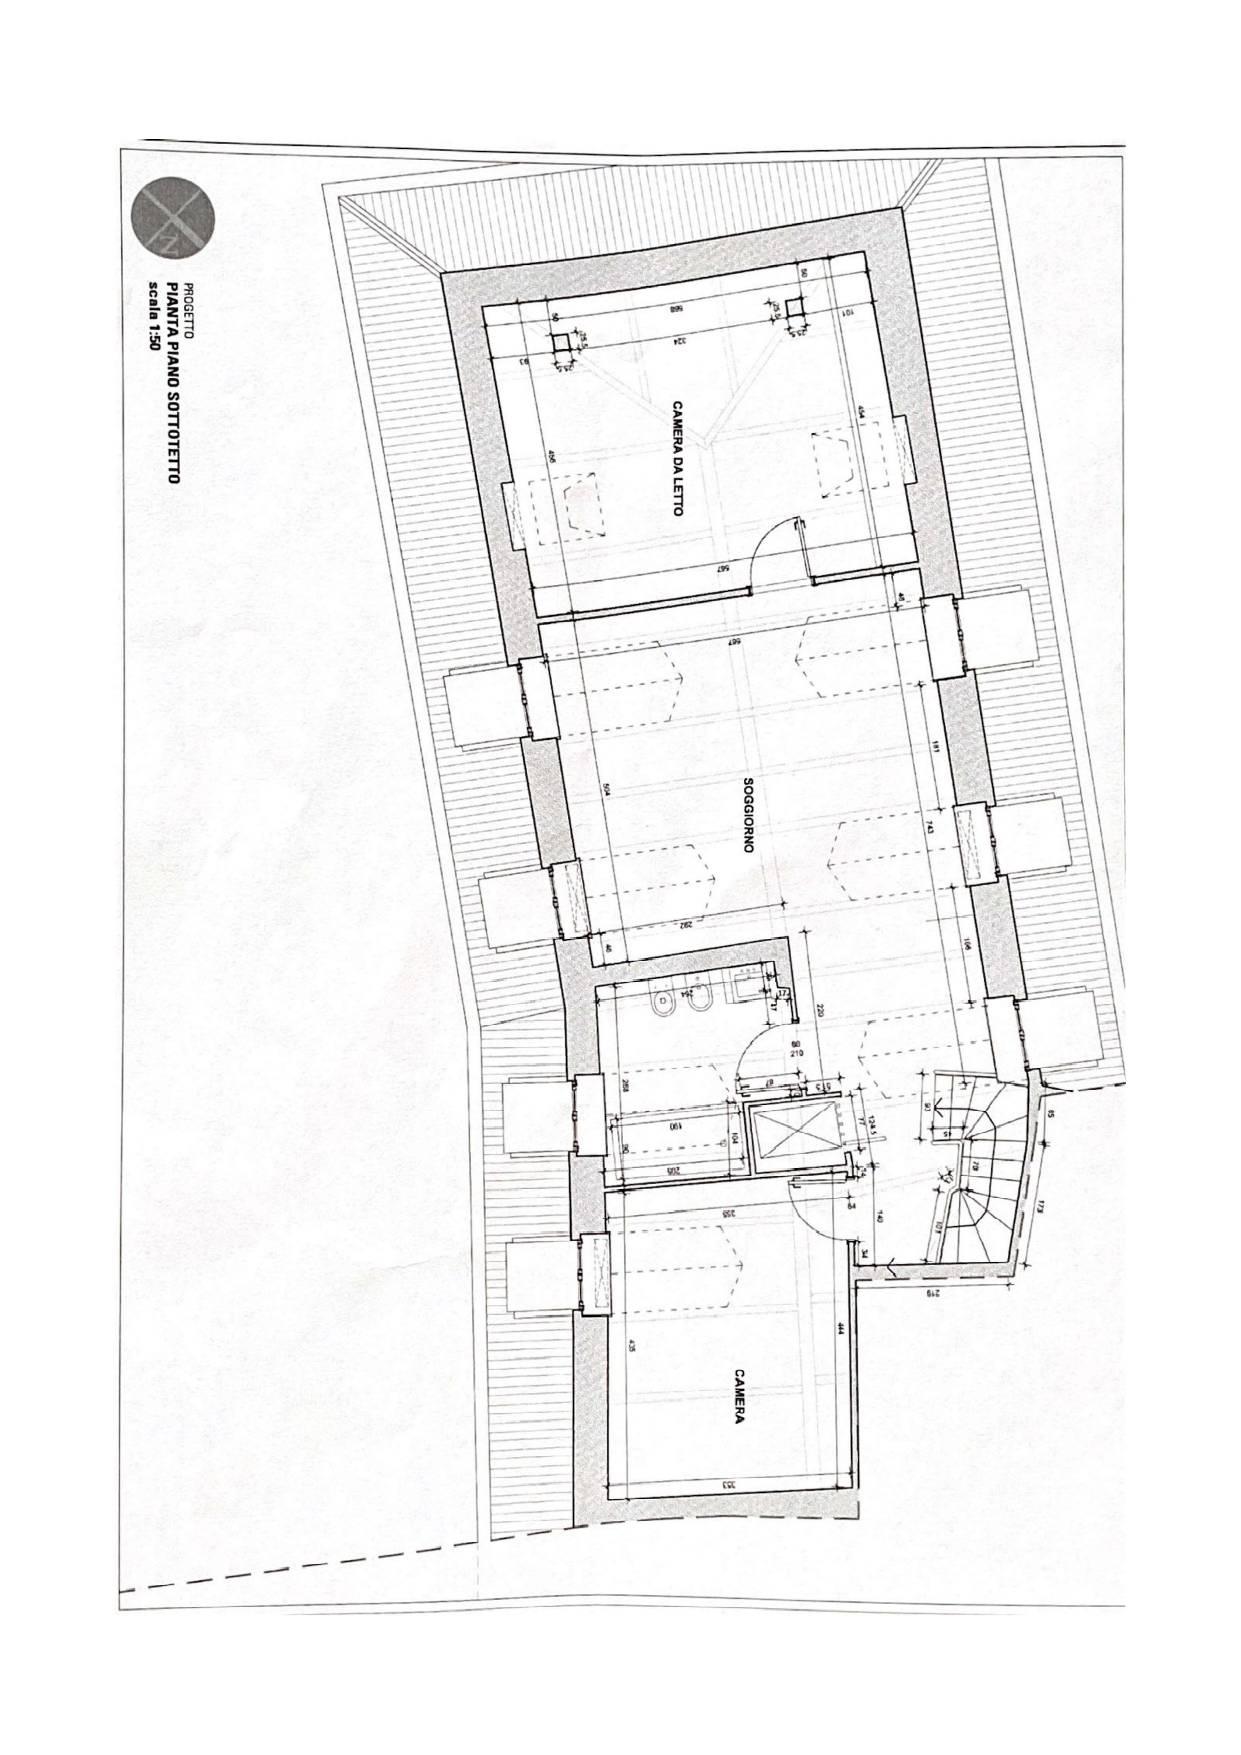 Casa indipendente in Vendita a Torino: 5 locali, 400 mq - Foto 23